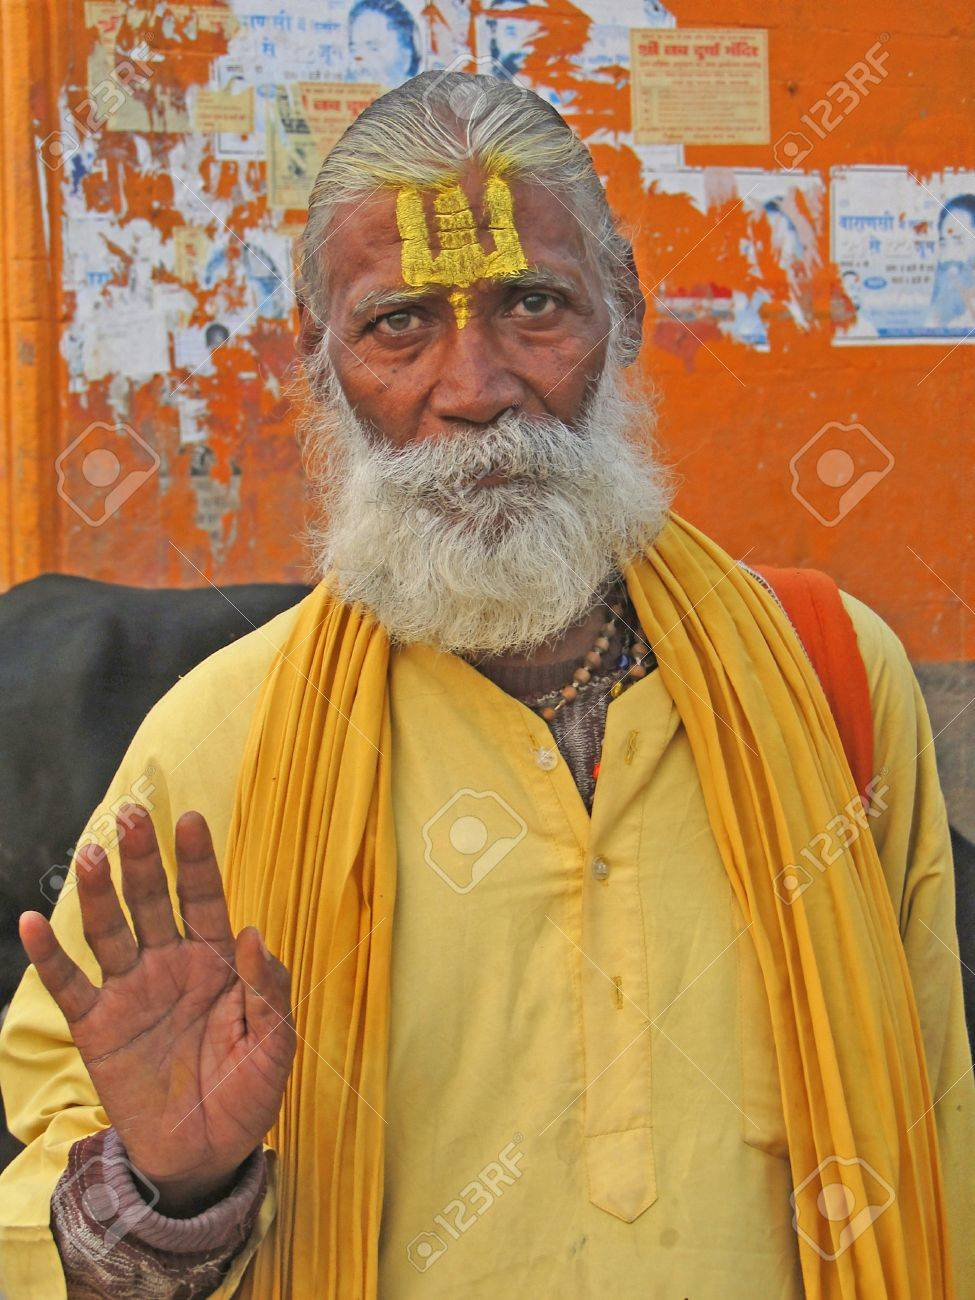 VARANASI, INDIA - NOV 6 -  Hindu Sadhu gives blessings on the bathing ghats on Nov 6, 2009,  in Varanasi, India.         Stock Photo - 15927473